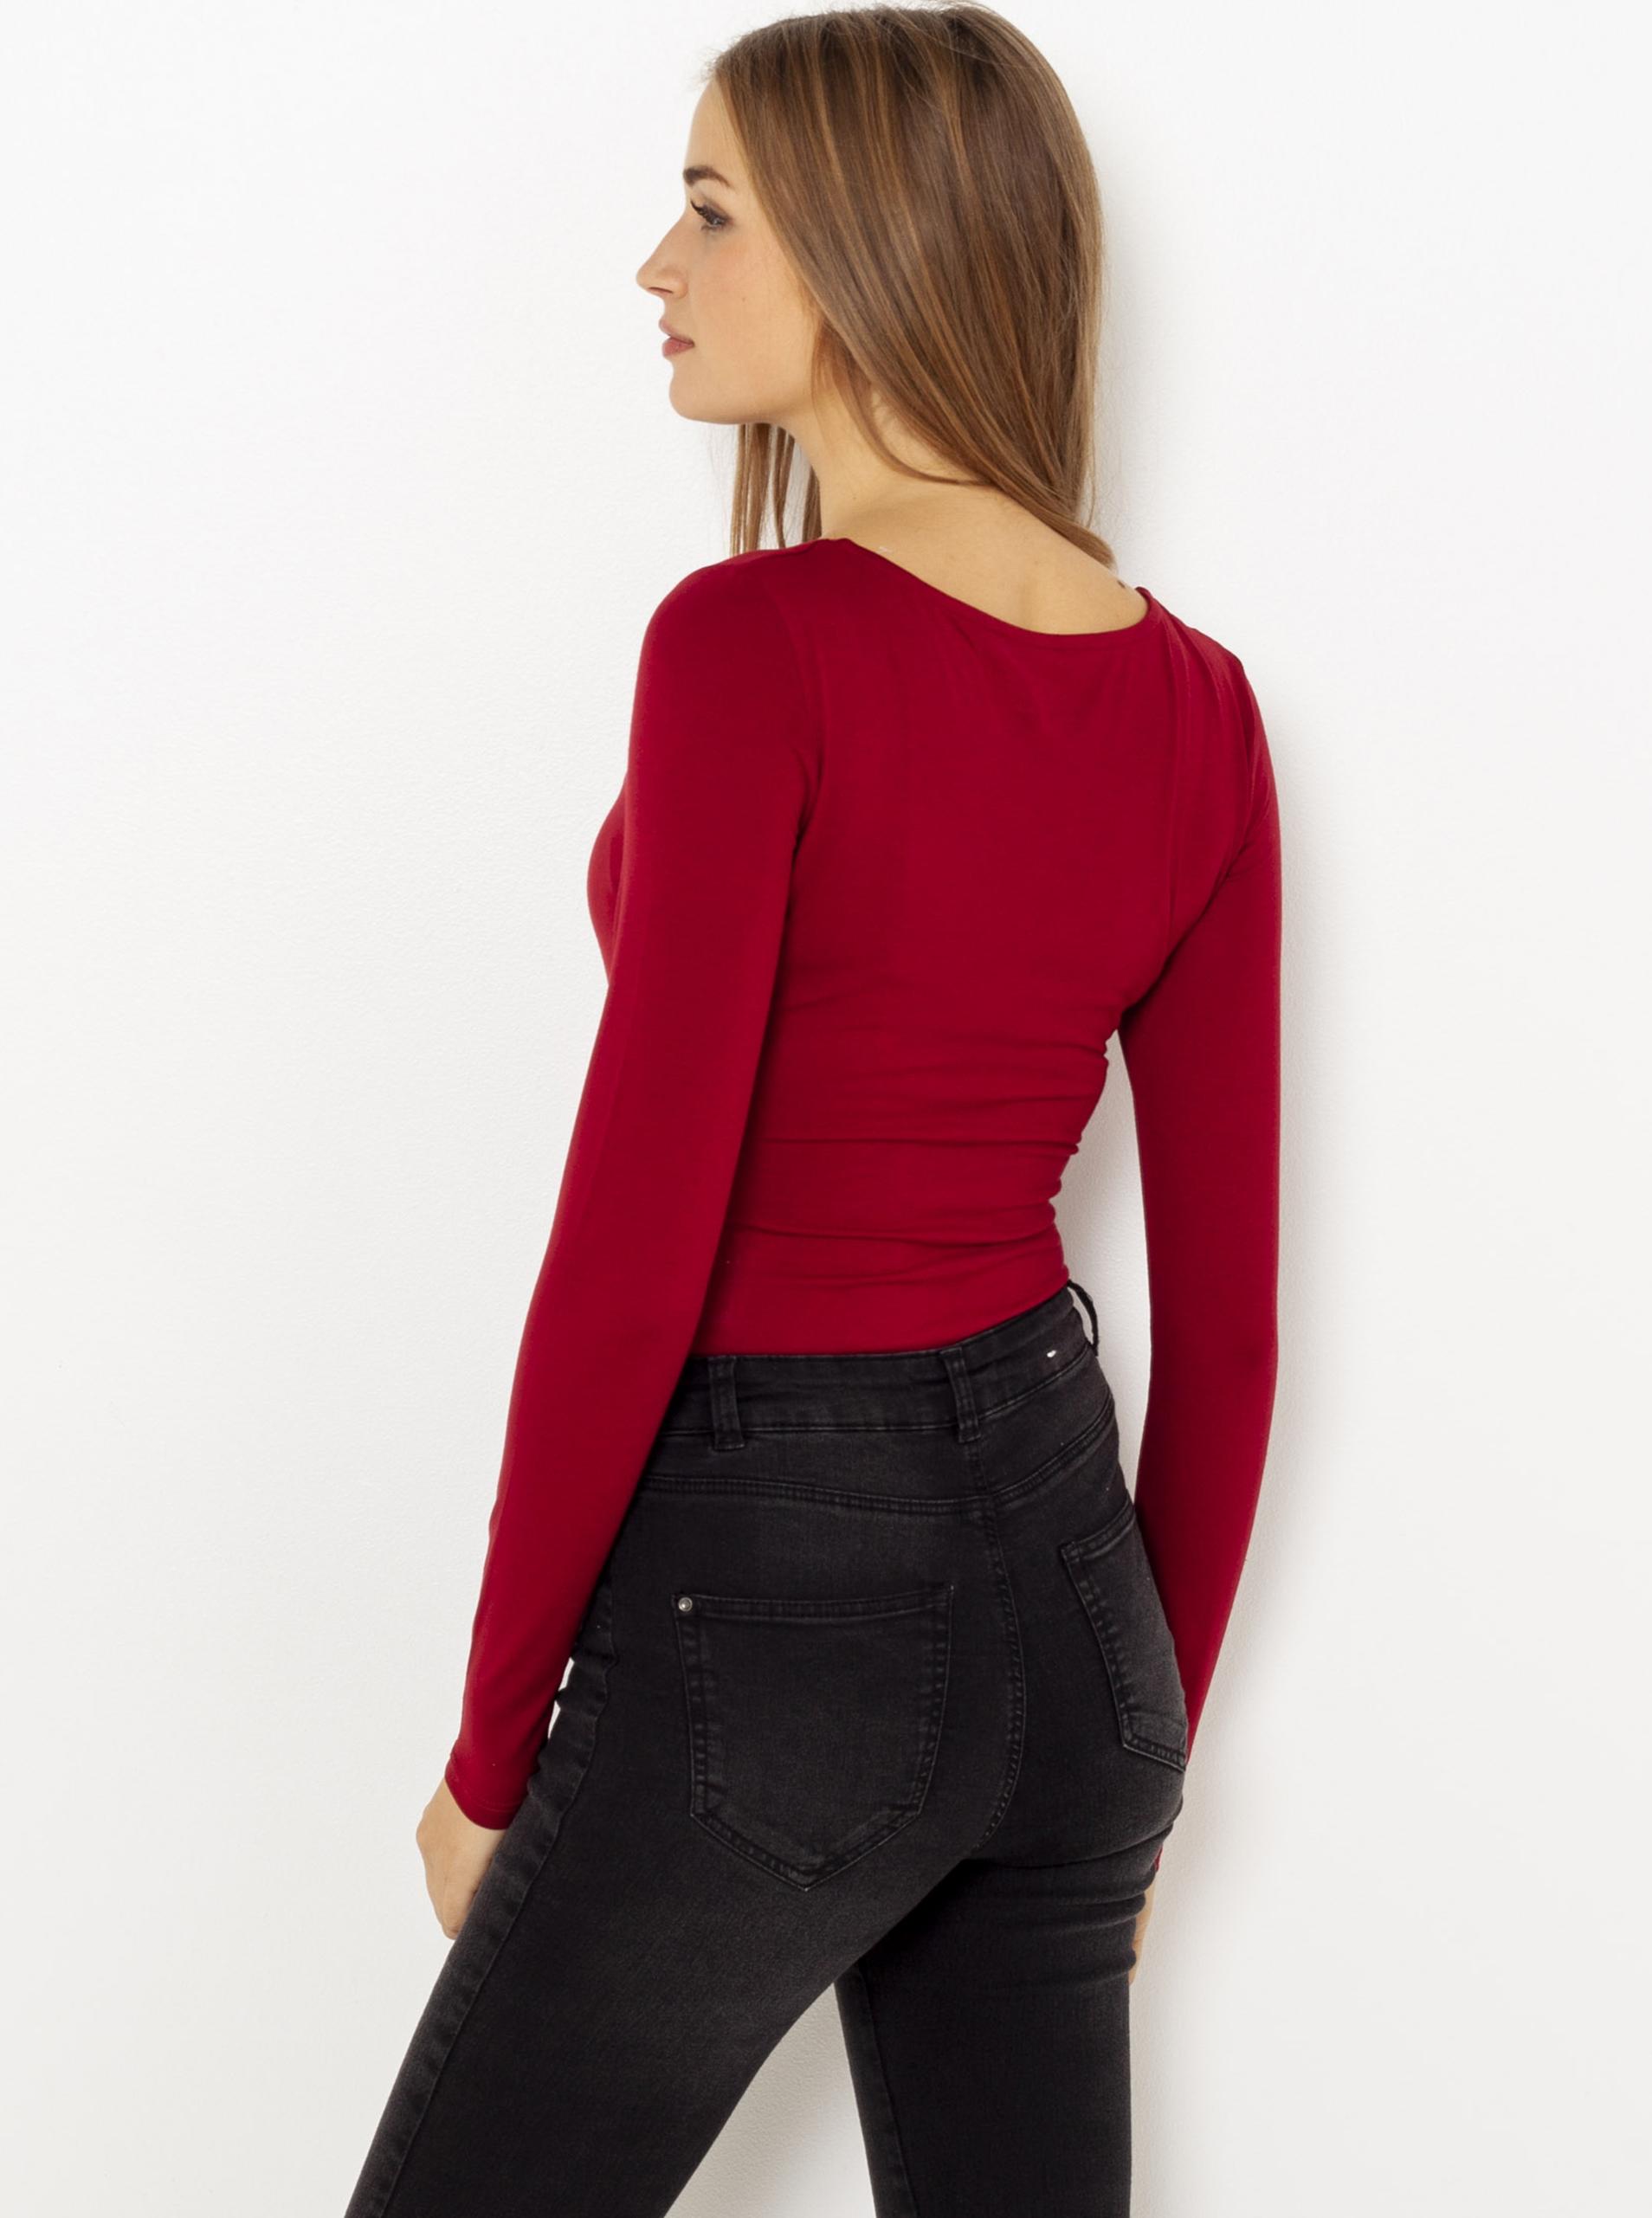 CAMAIEU Women's bodysuit red